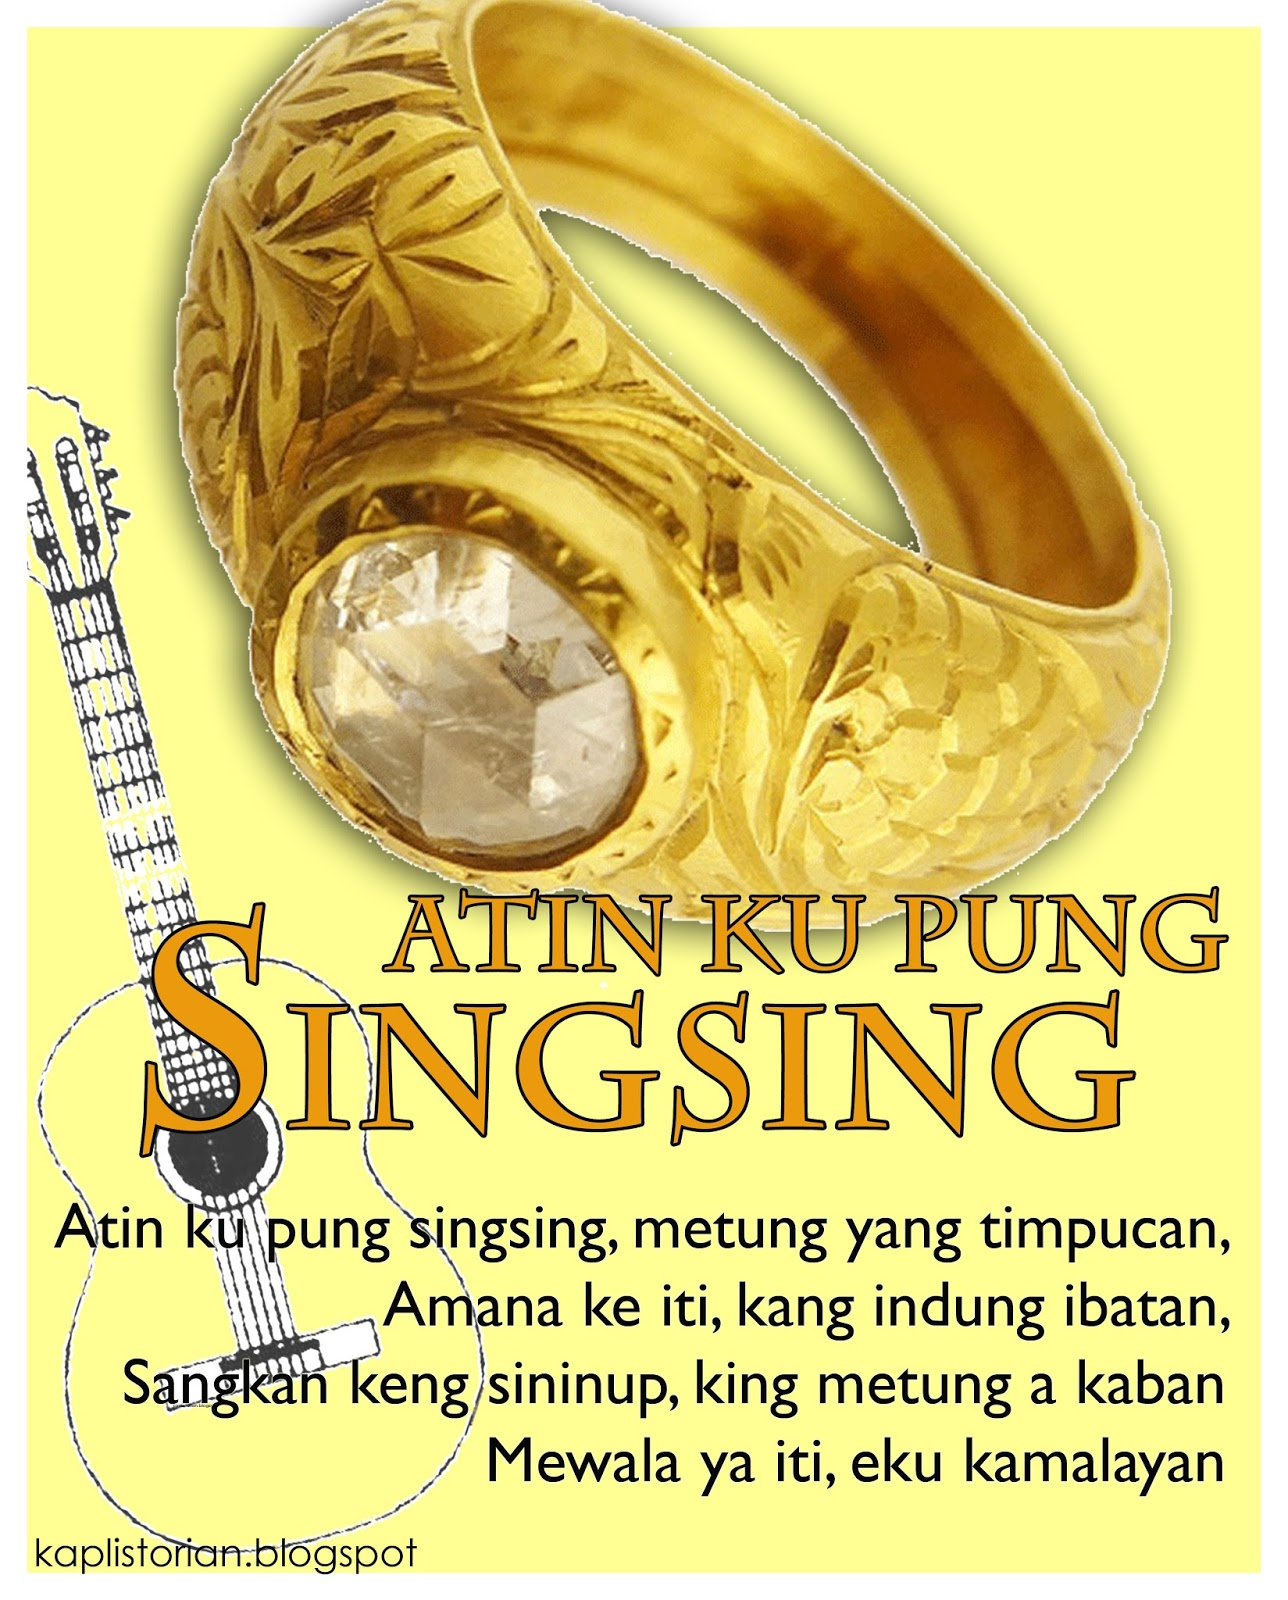 Pung historical background atin singsing cu Sinukwan Festival